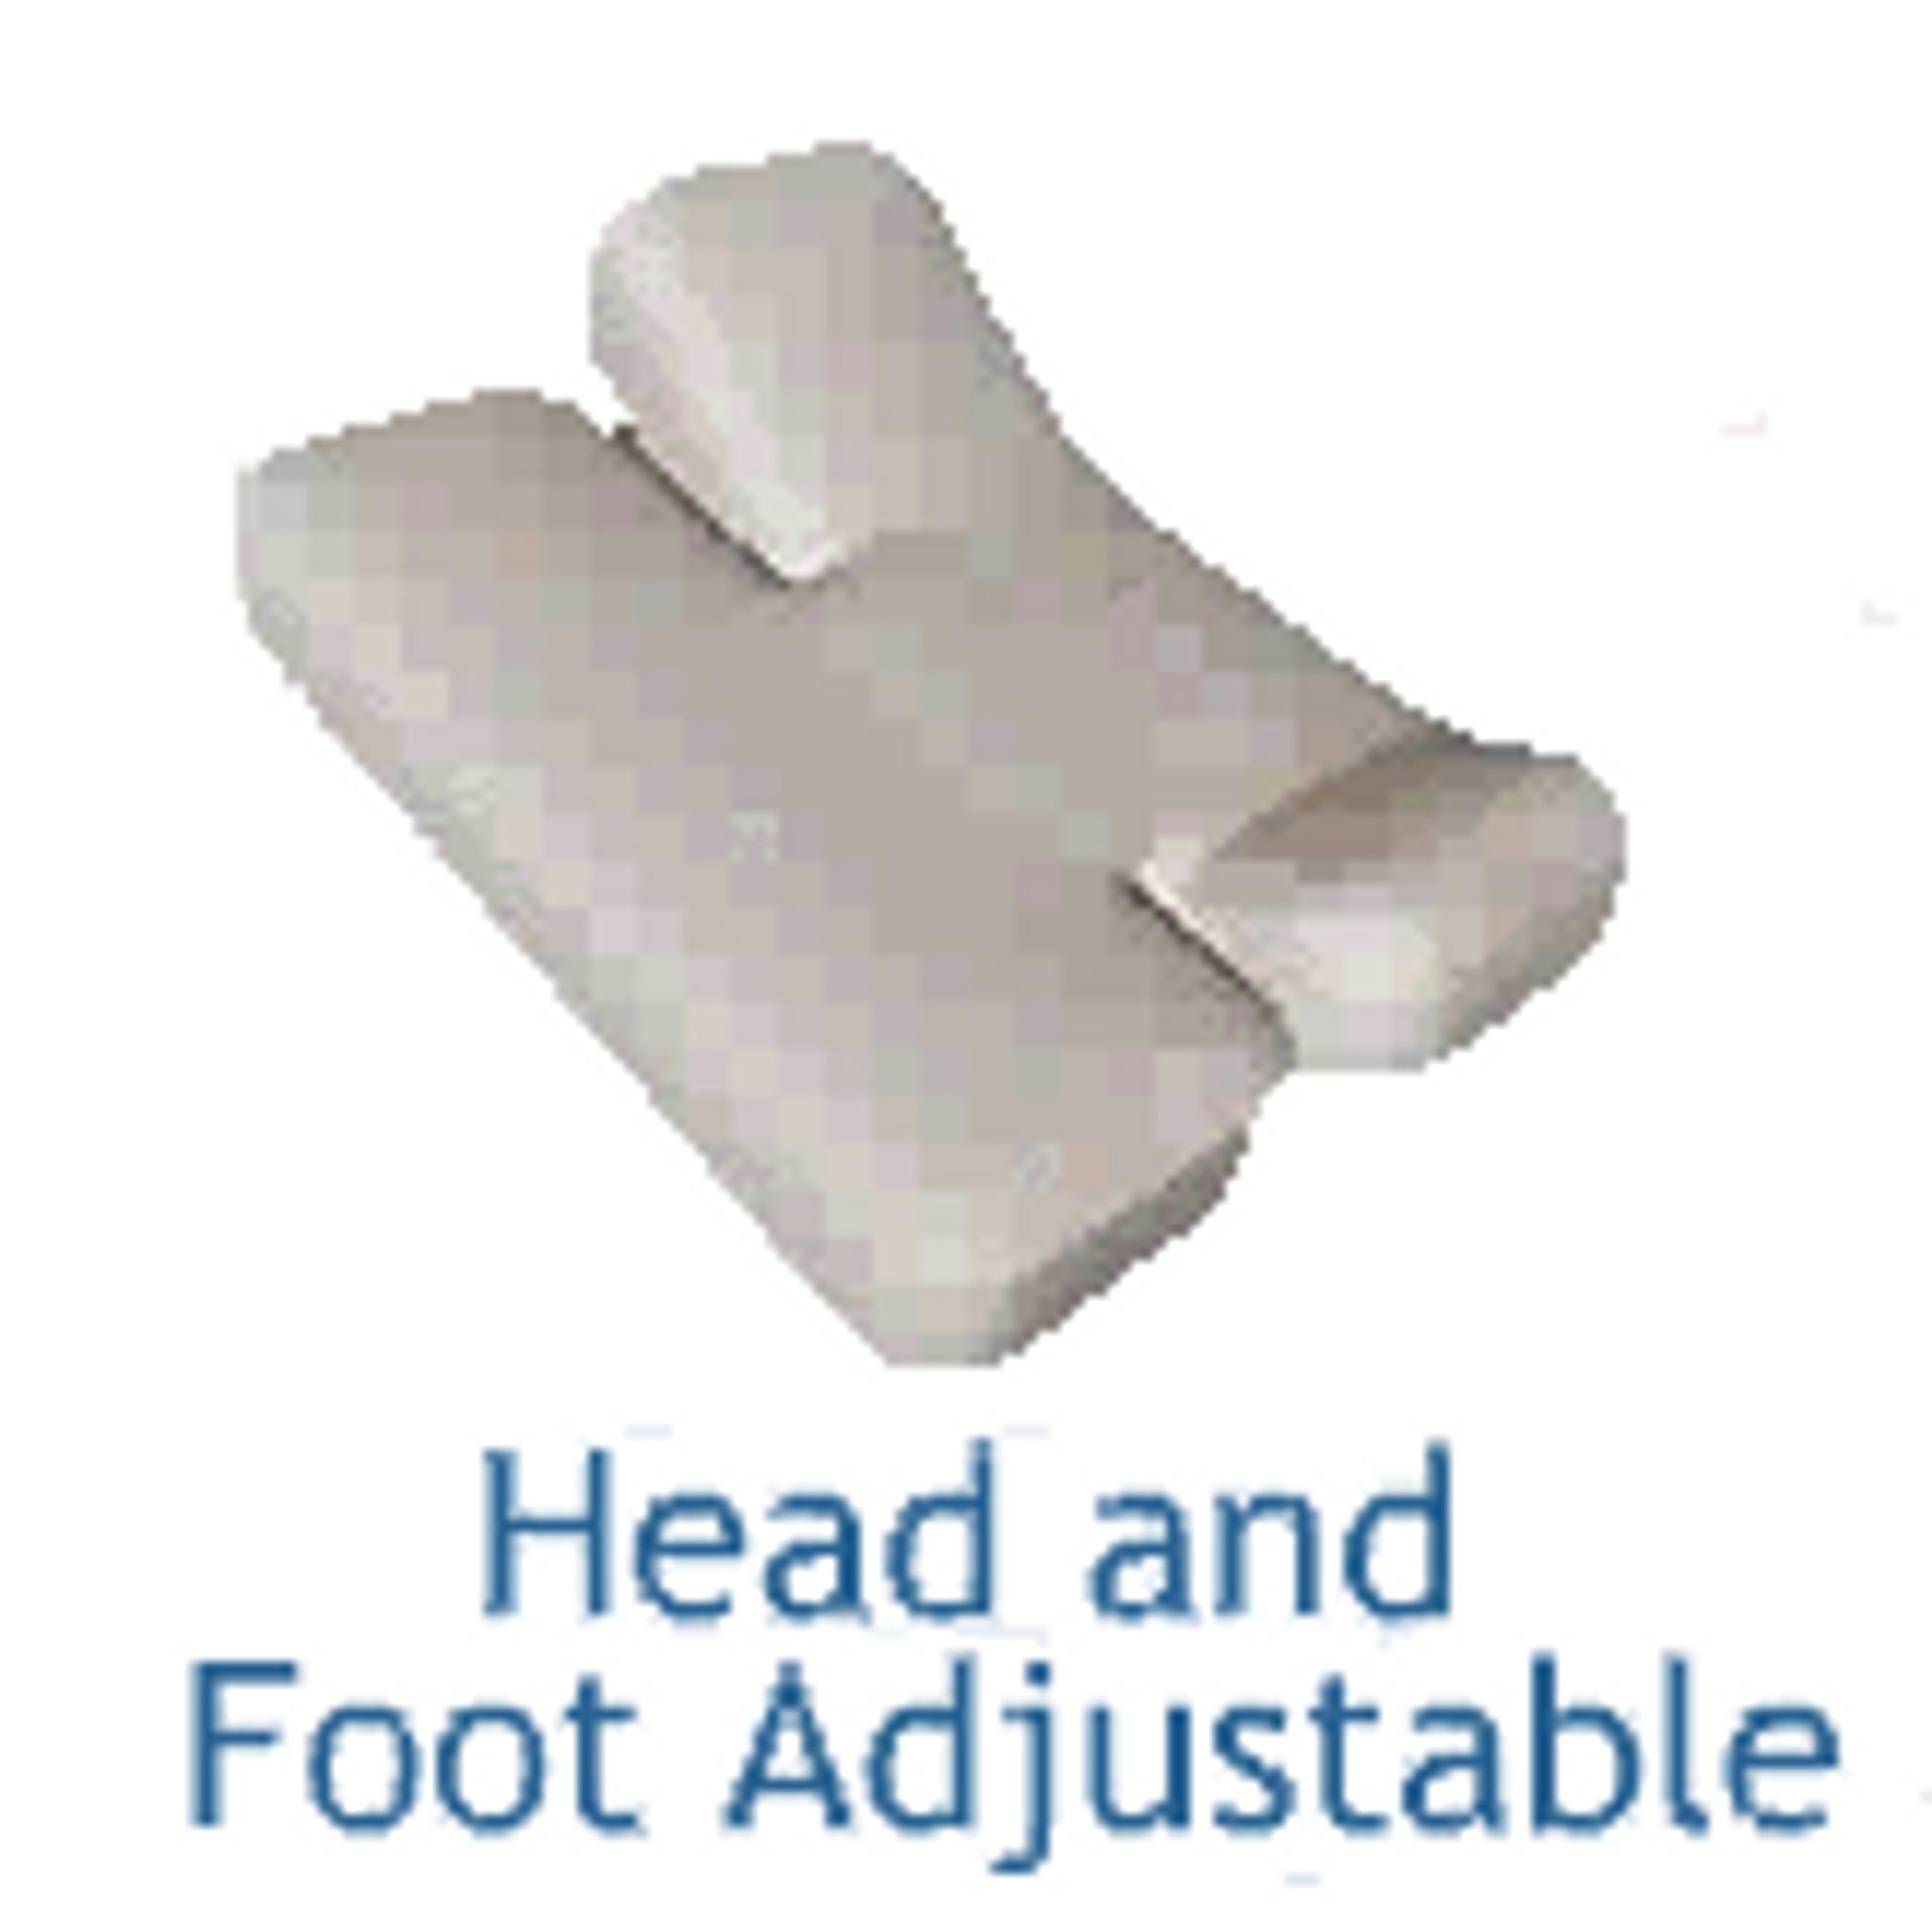 Adjustable Bed - Split-Head and Foot